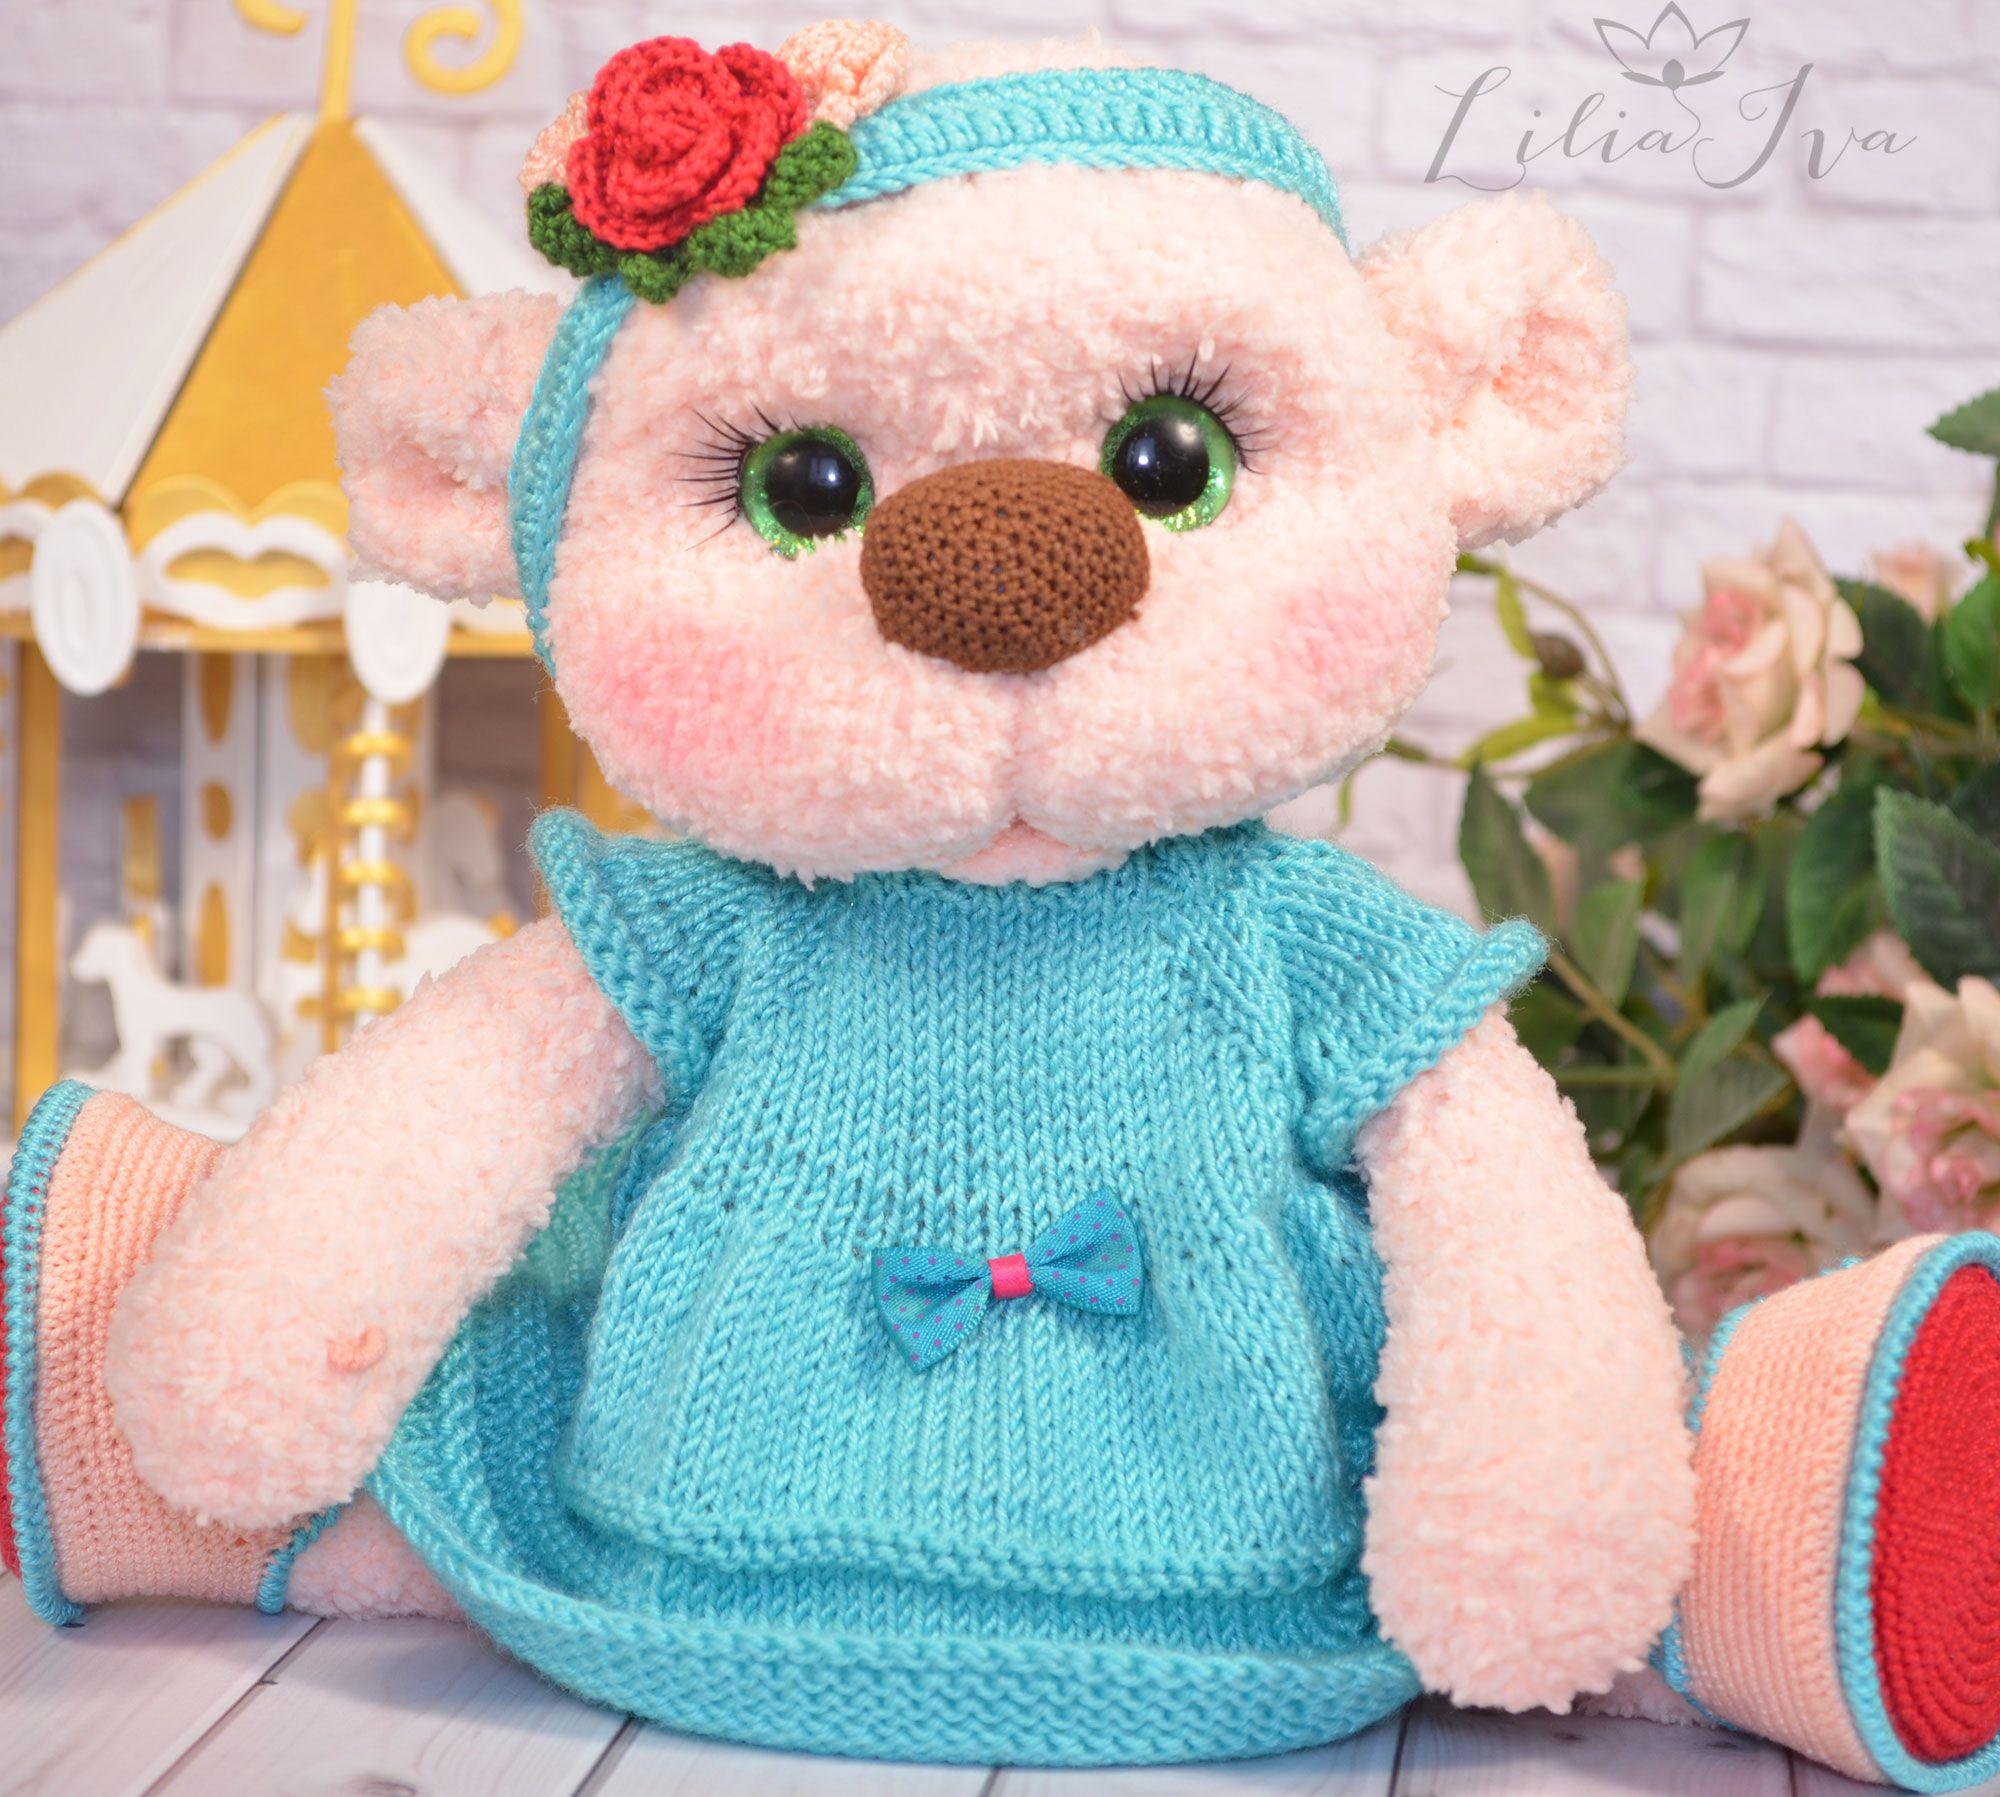 медведь мишка игрушкаручнойработы купитьмишку купитьигрушку мишкатедди мягкаяигрушка амигуруми вязанаяигрушка мишкаручнойработы